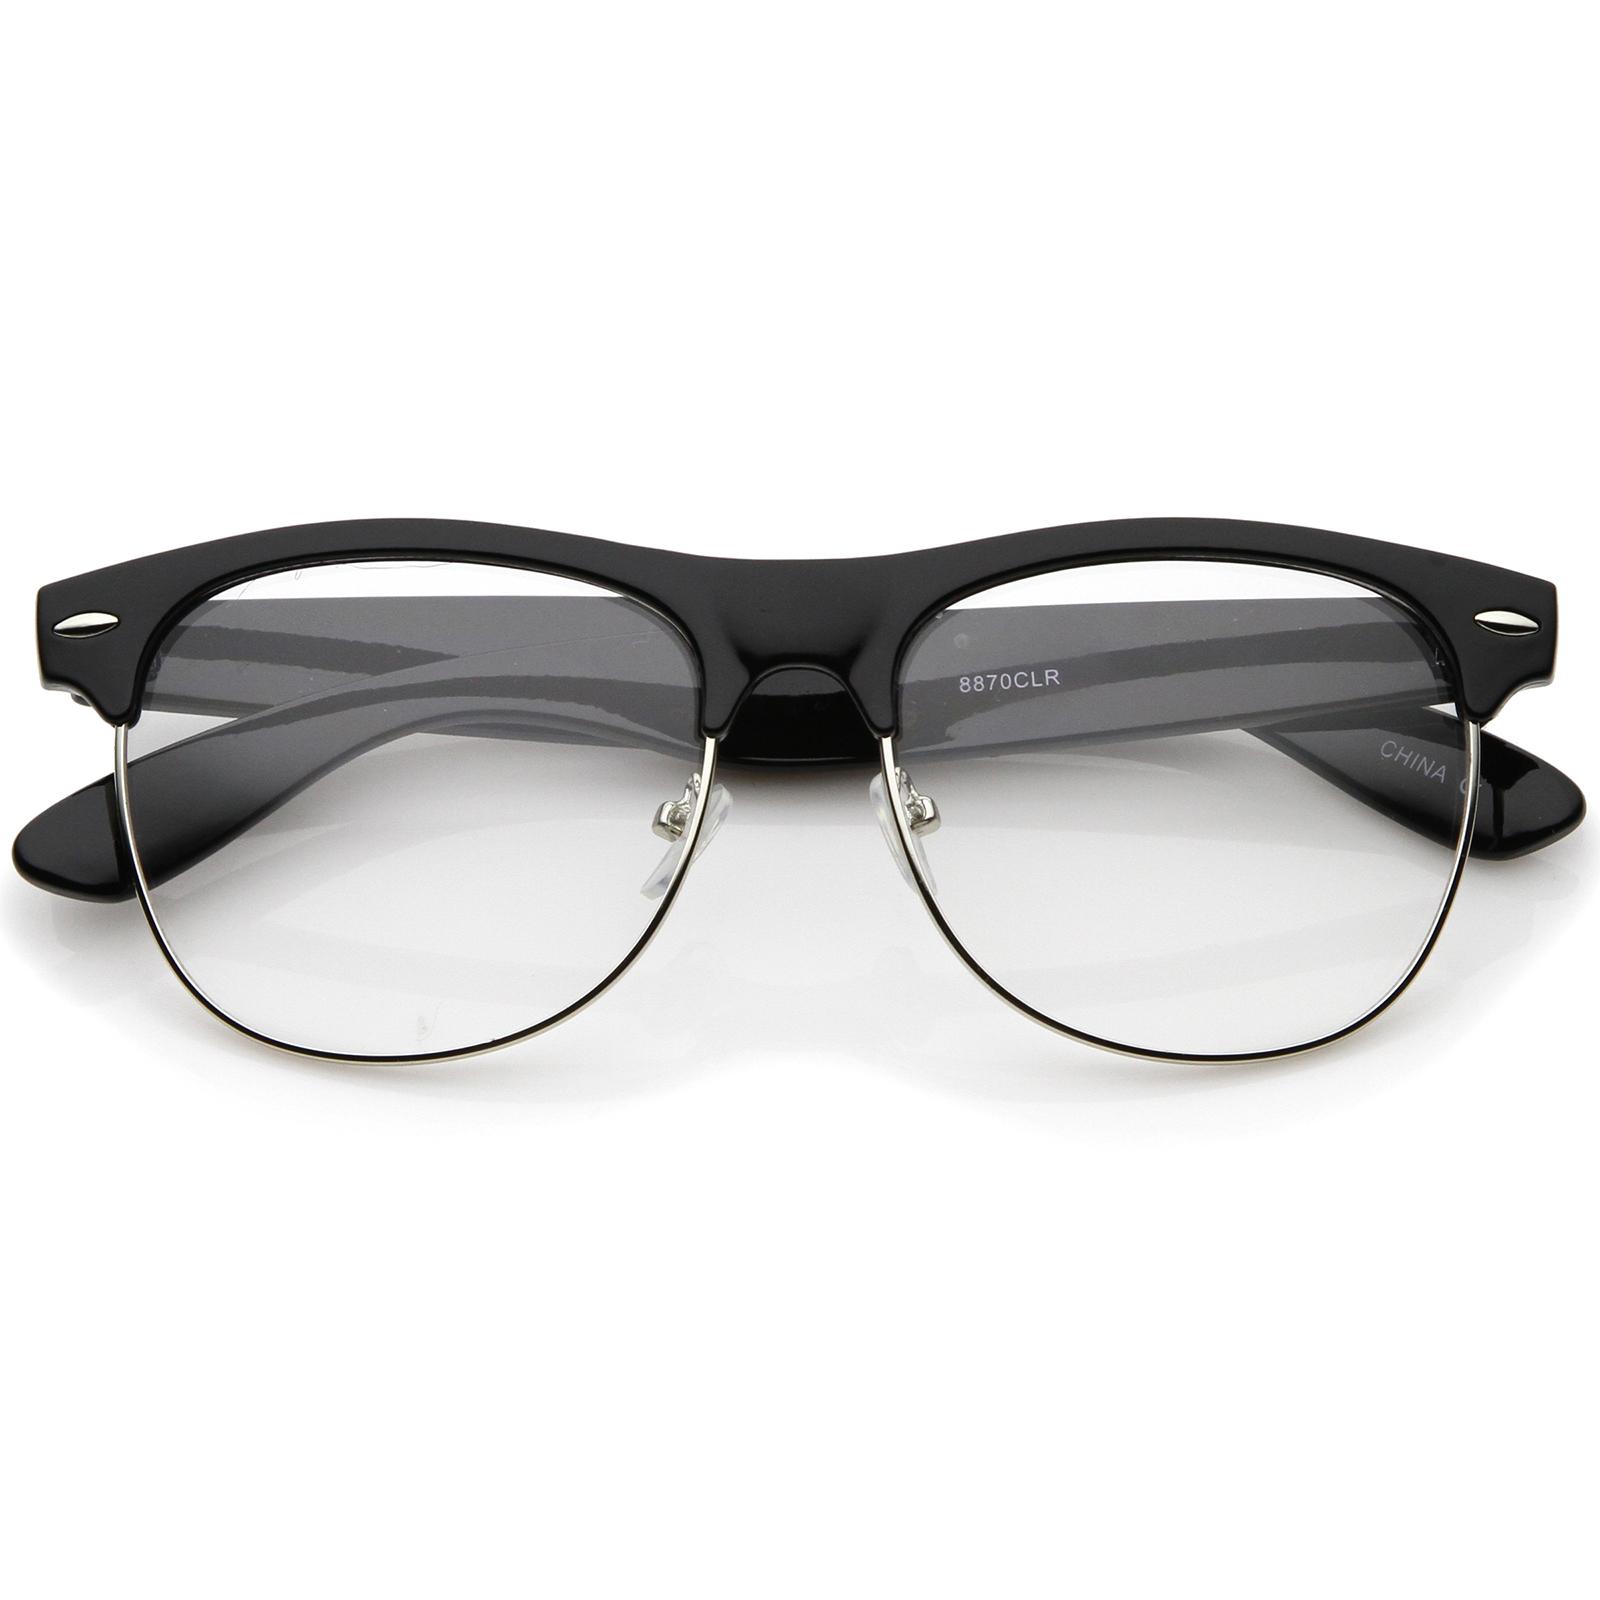 Half Frame Glasses Boots : sunglassLA Classic Horn Rimmed Clear Lens Half Frame ...